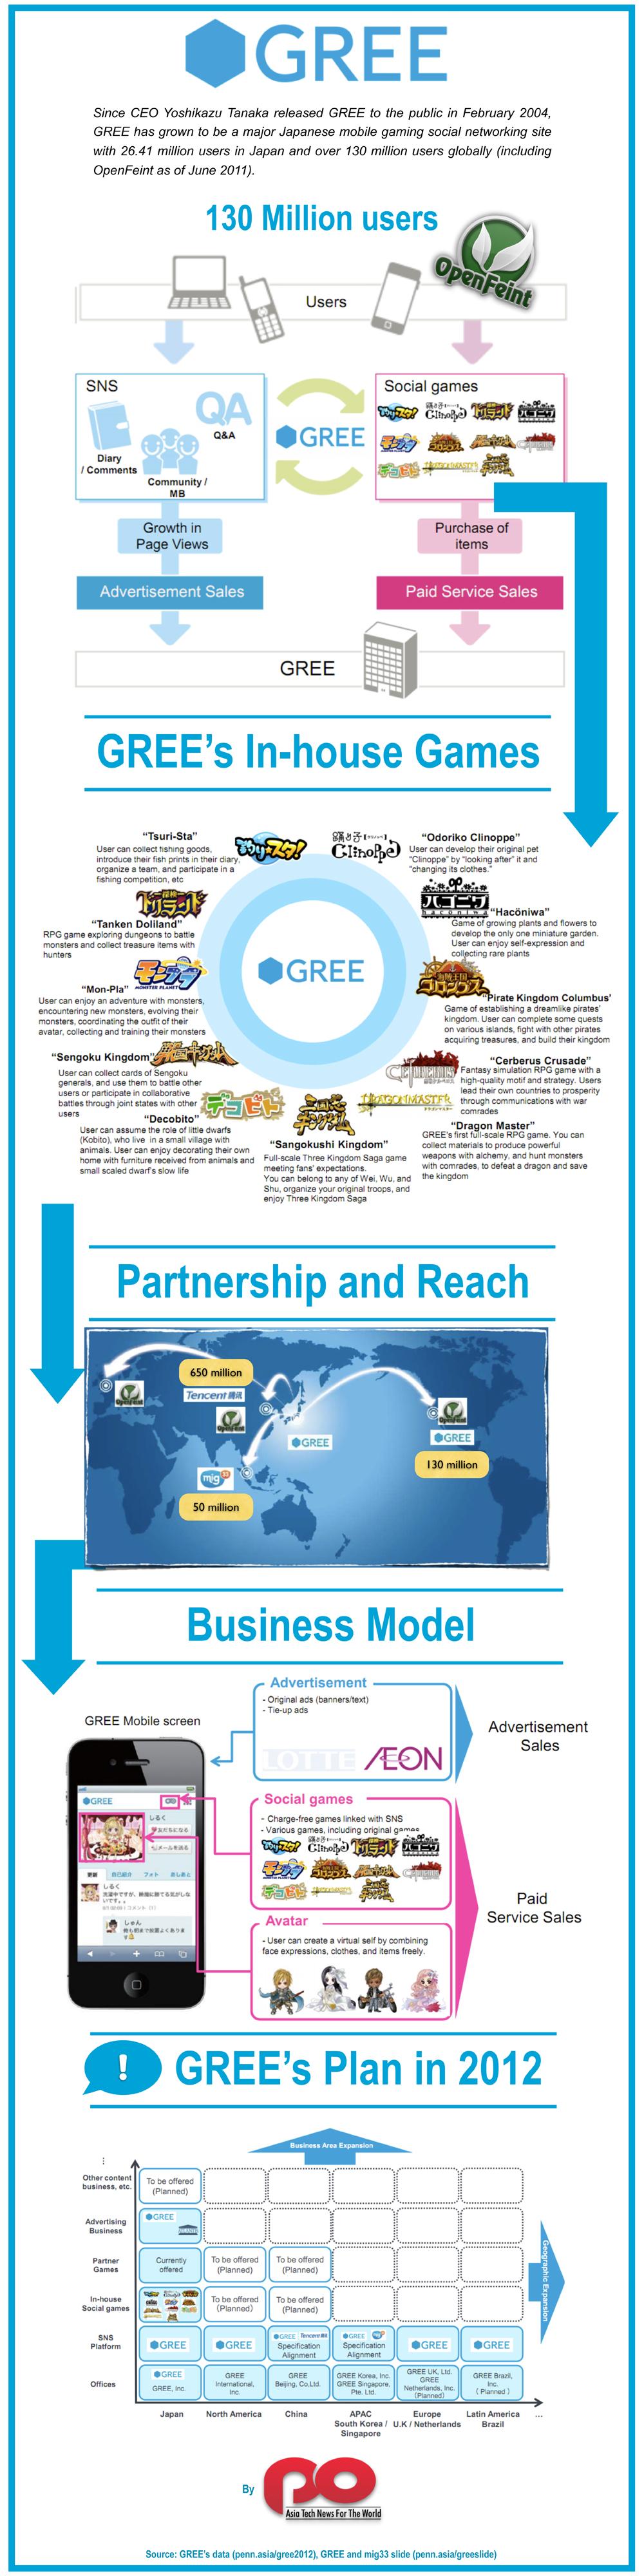 gree-infographic